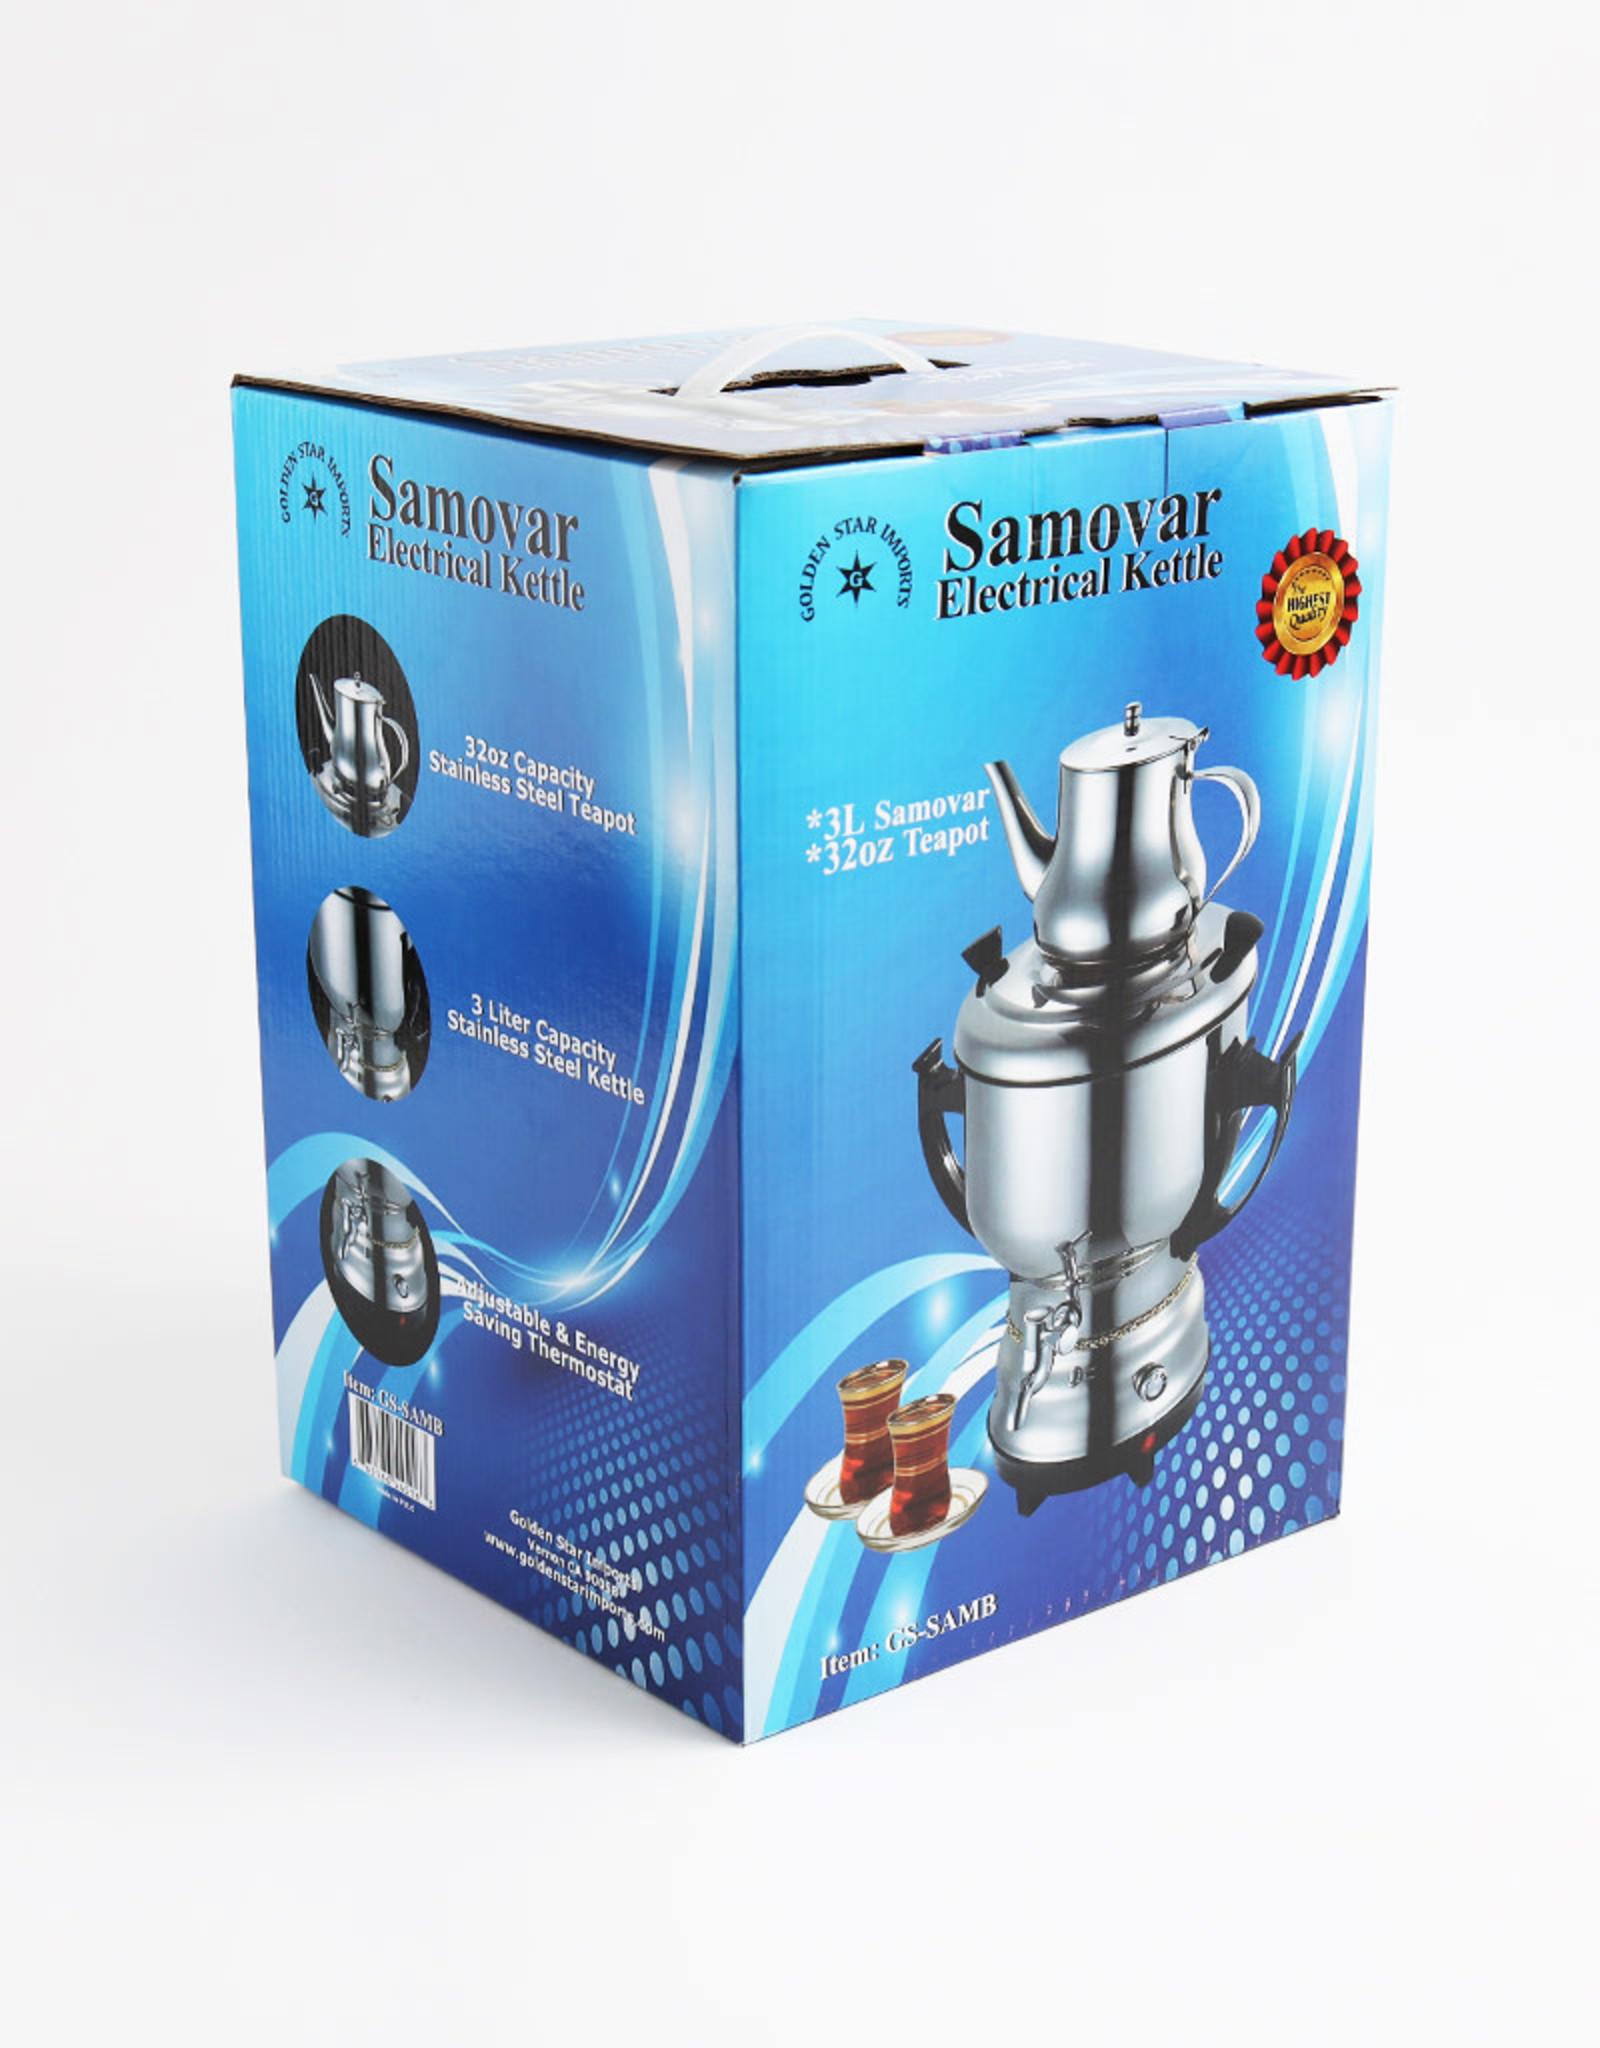 Stainless Steel Samovar 3 liters, Black Handles